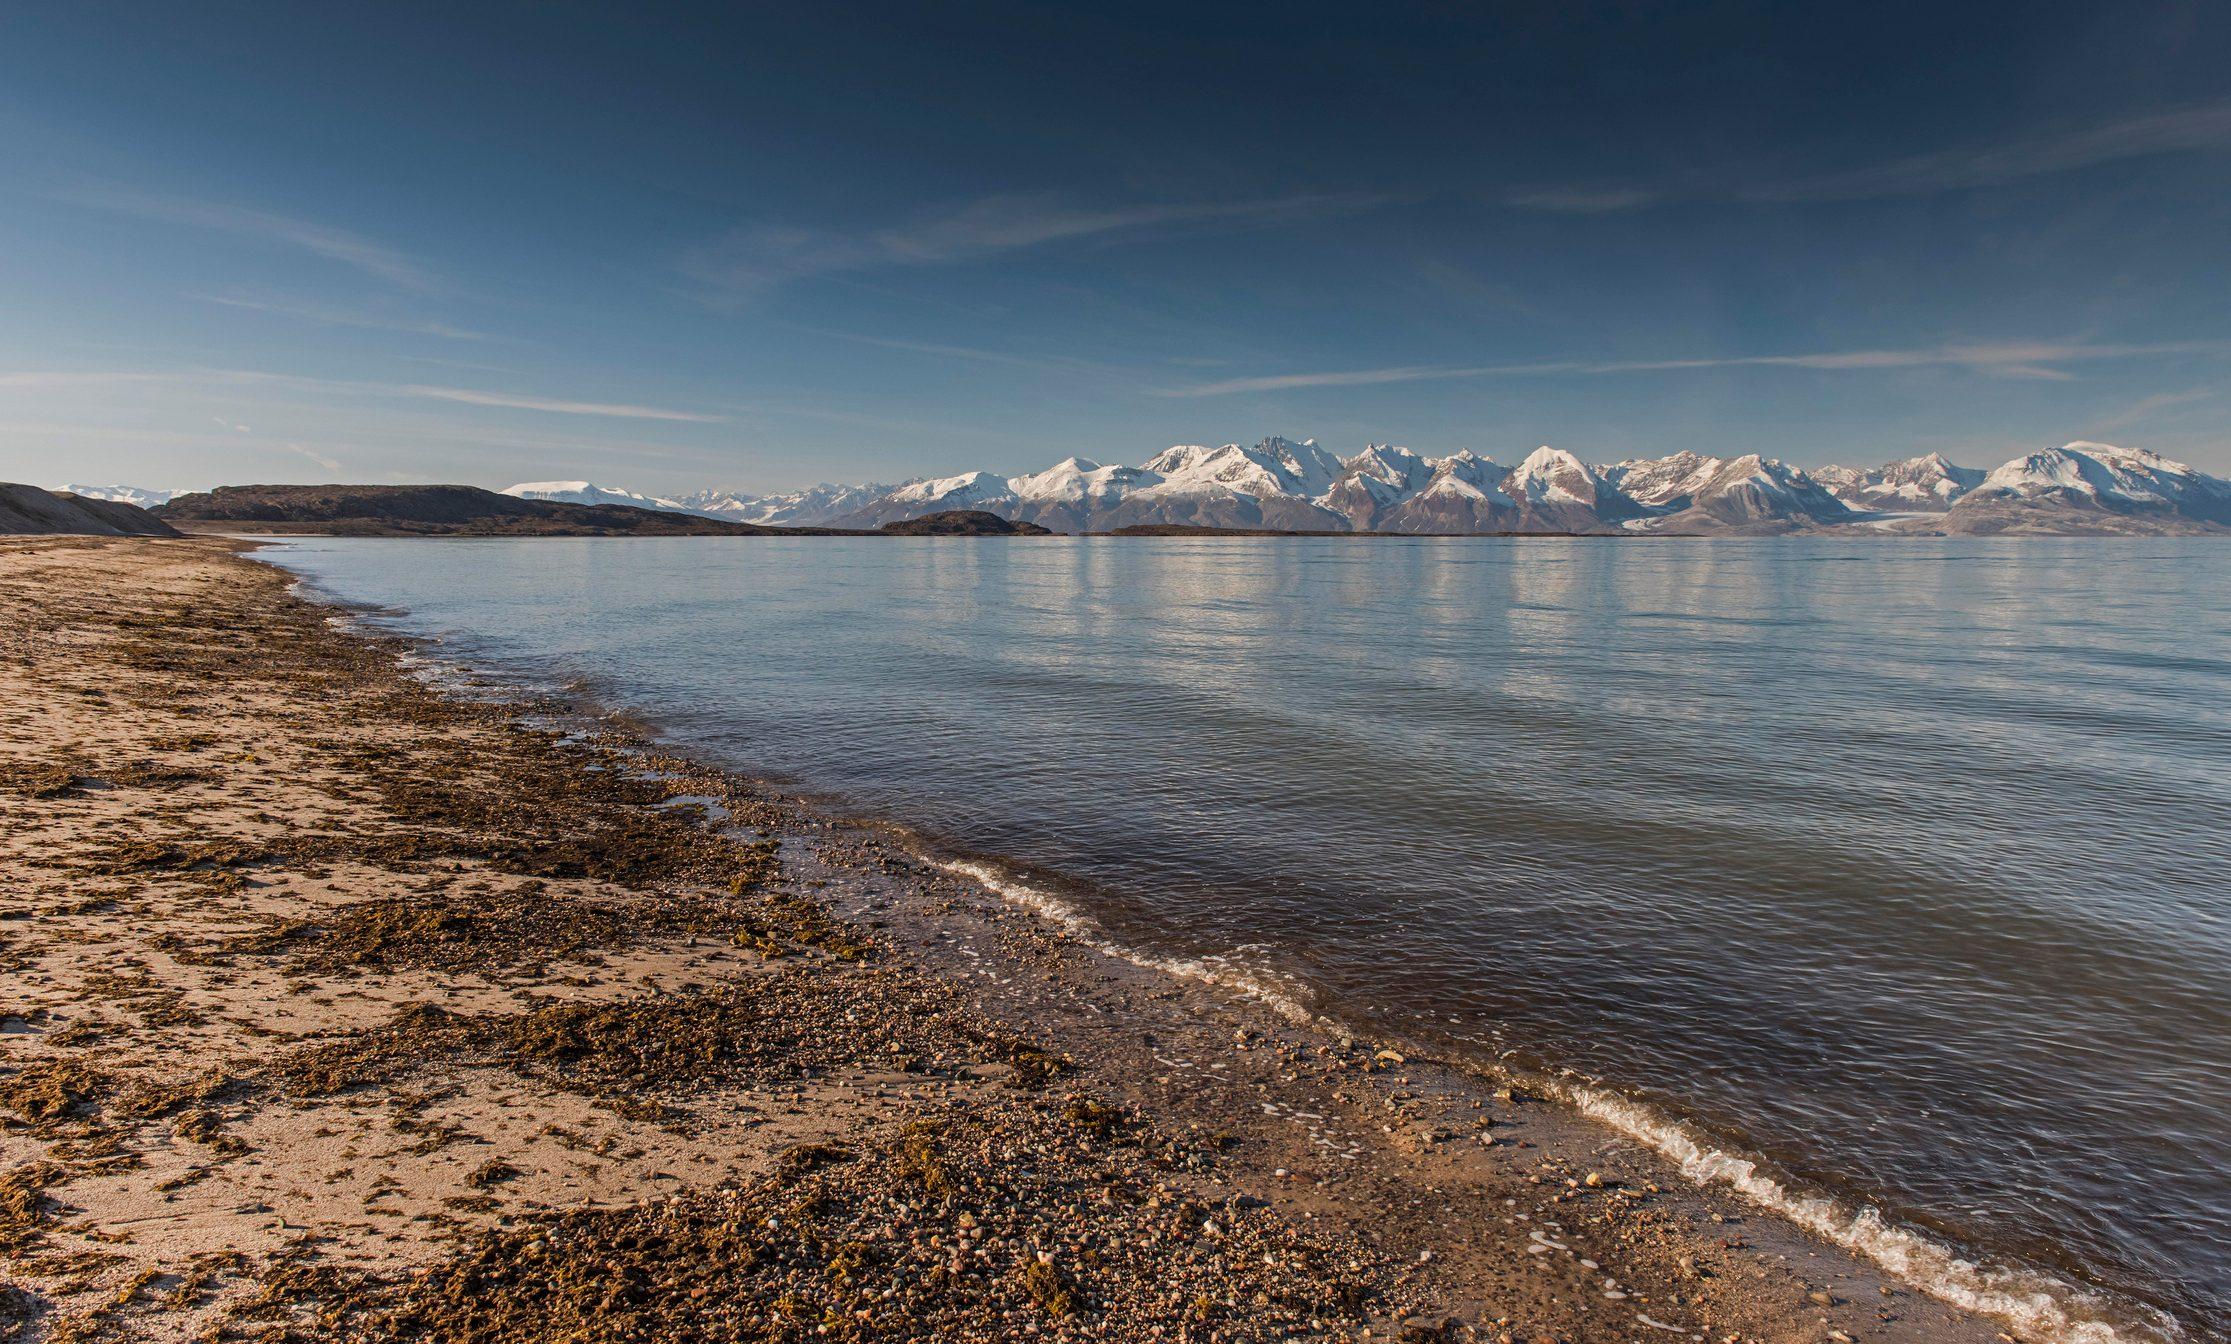 Beach, mountains, Holmbugt, Kong Oscar Fjord, Northeast Greenland National Park, Greenland